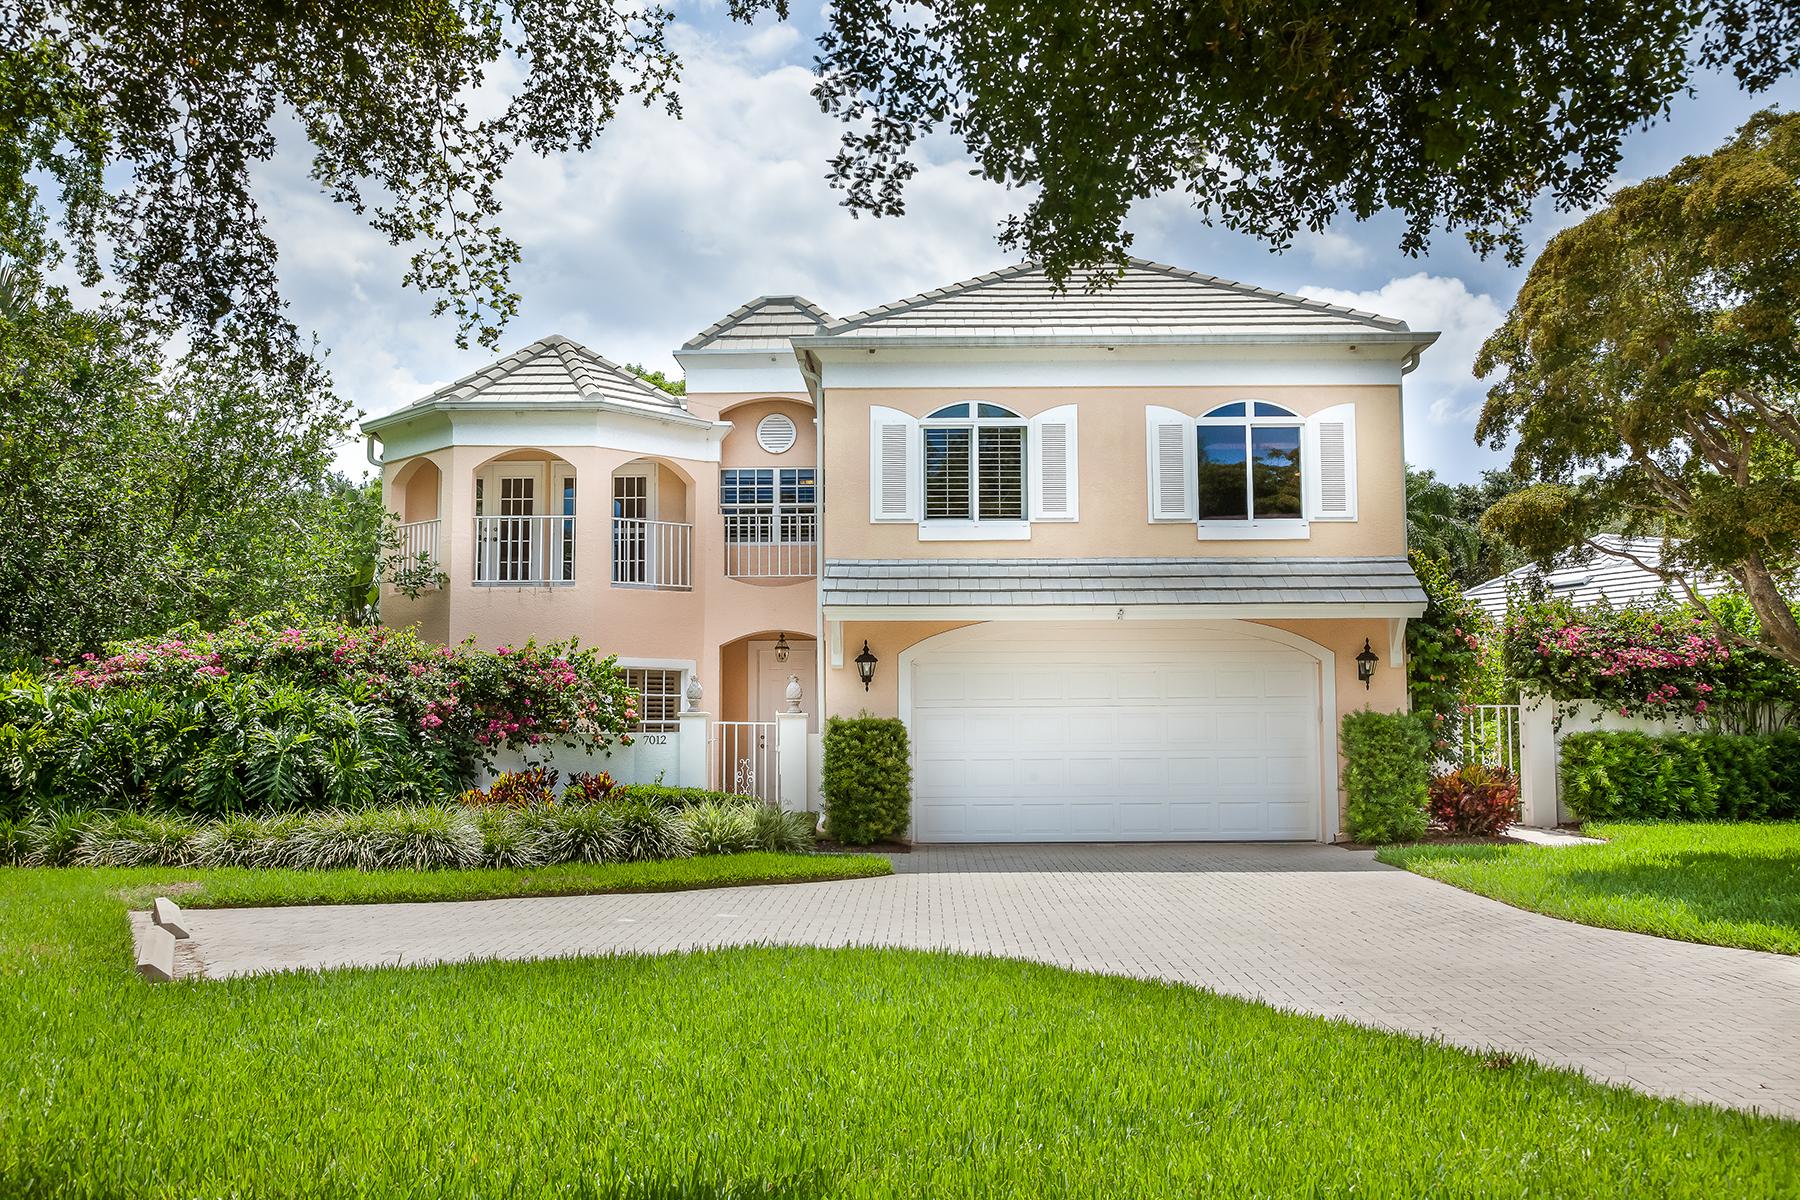 Condominium for Sale at PELICAN BAY - BEAUVILLE 7012 Rue De Marquis E-2.1 Naples, Florida, 34108 United States